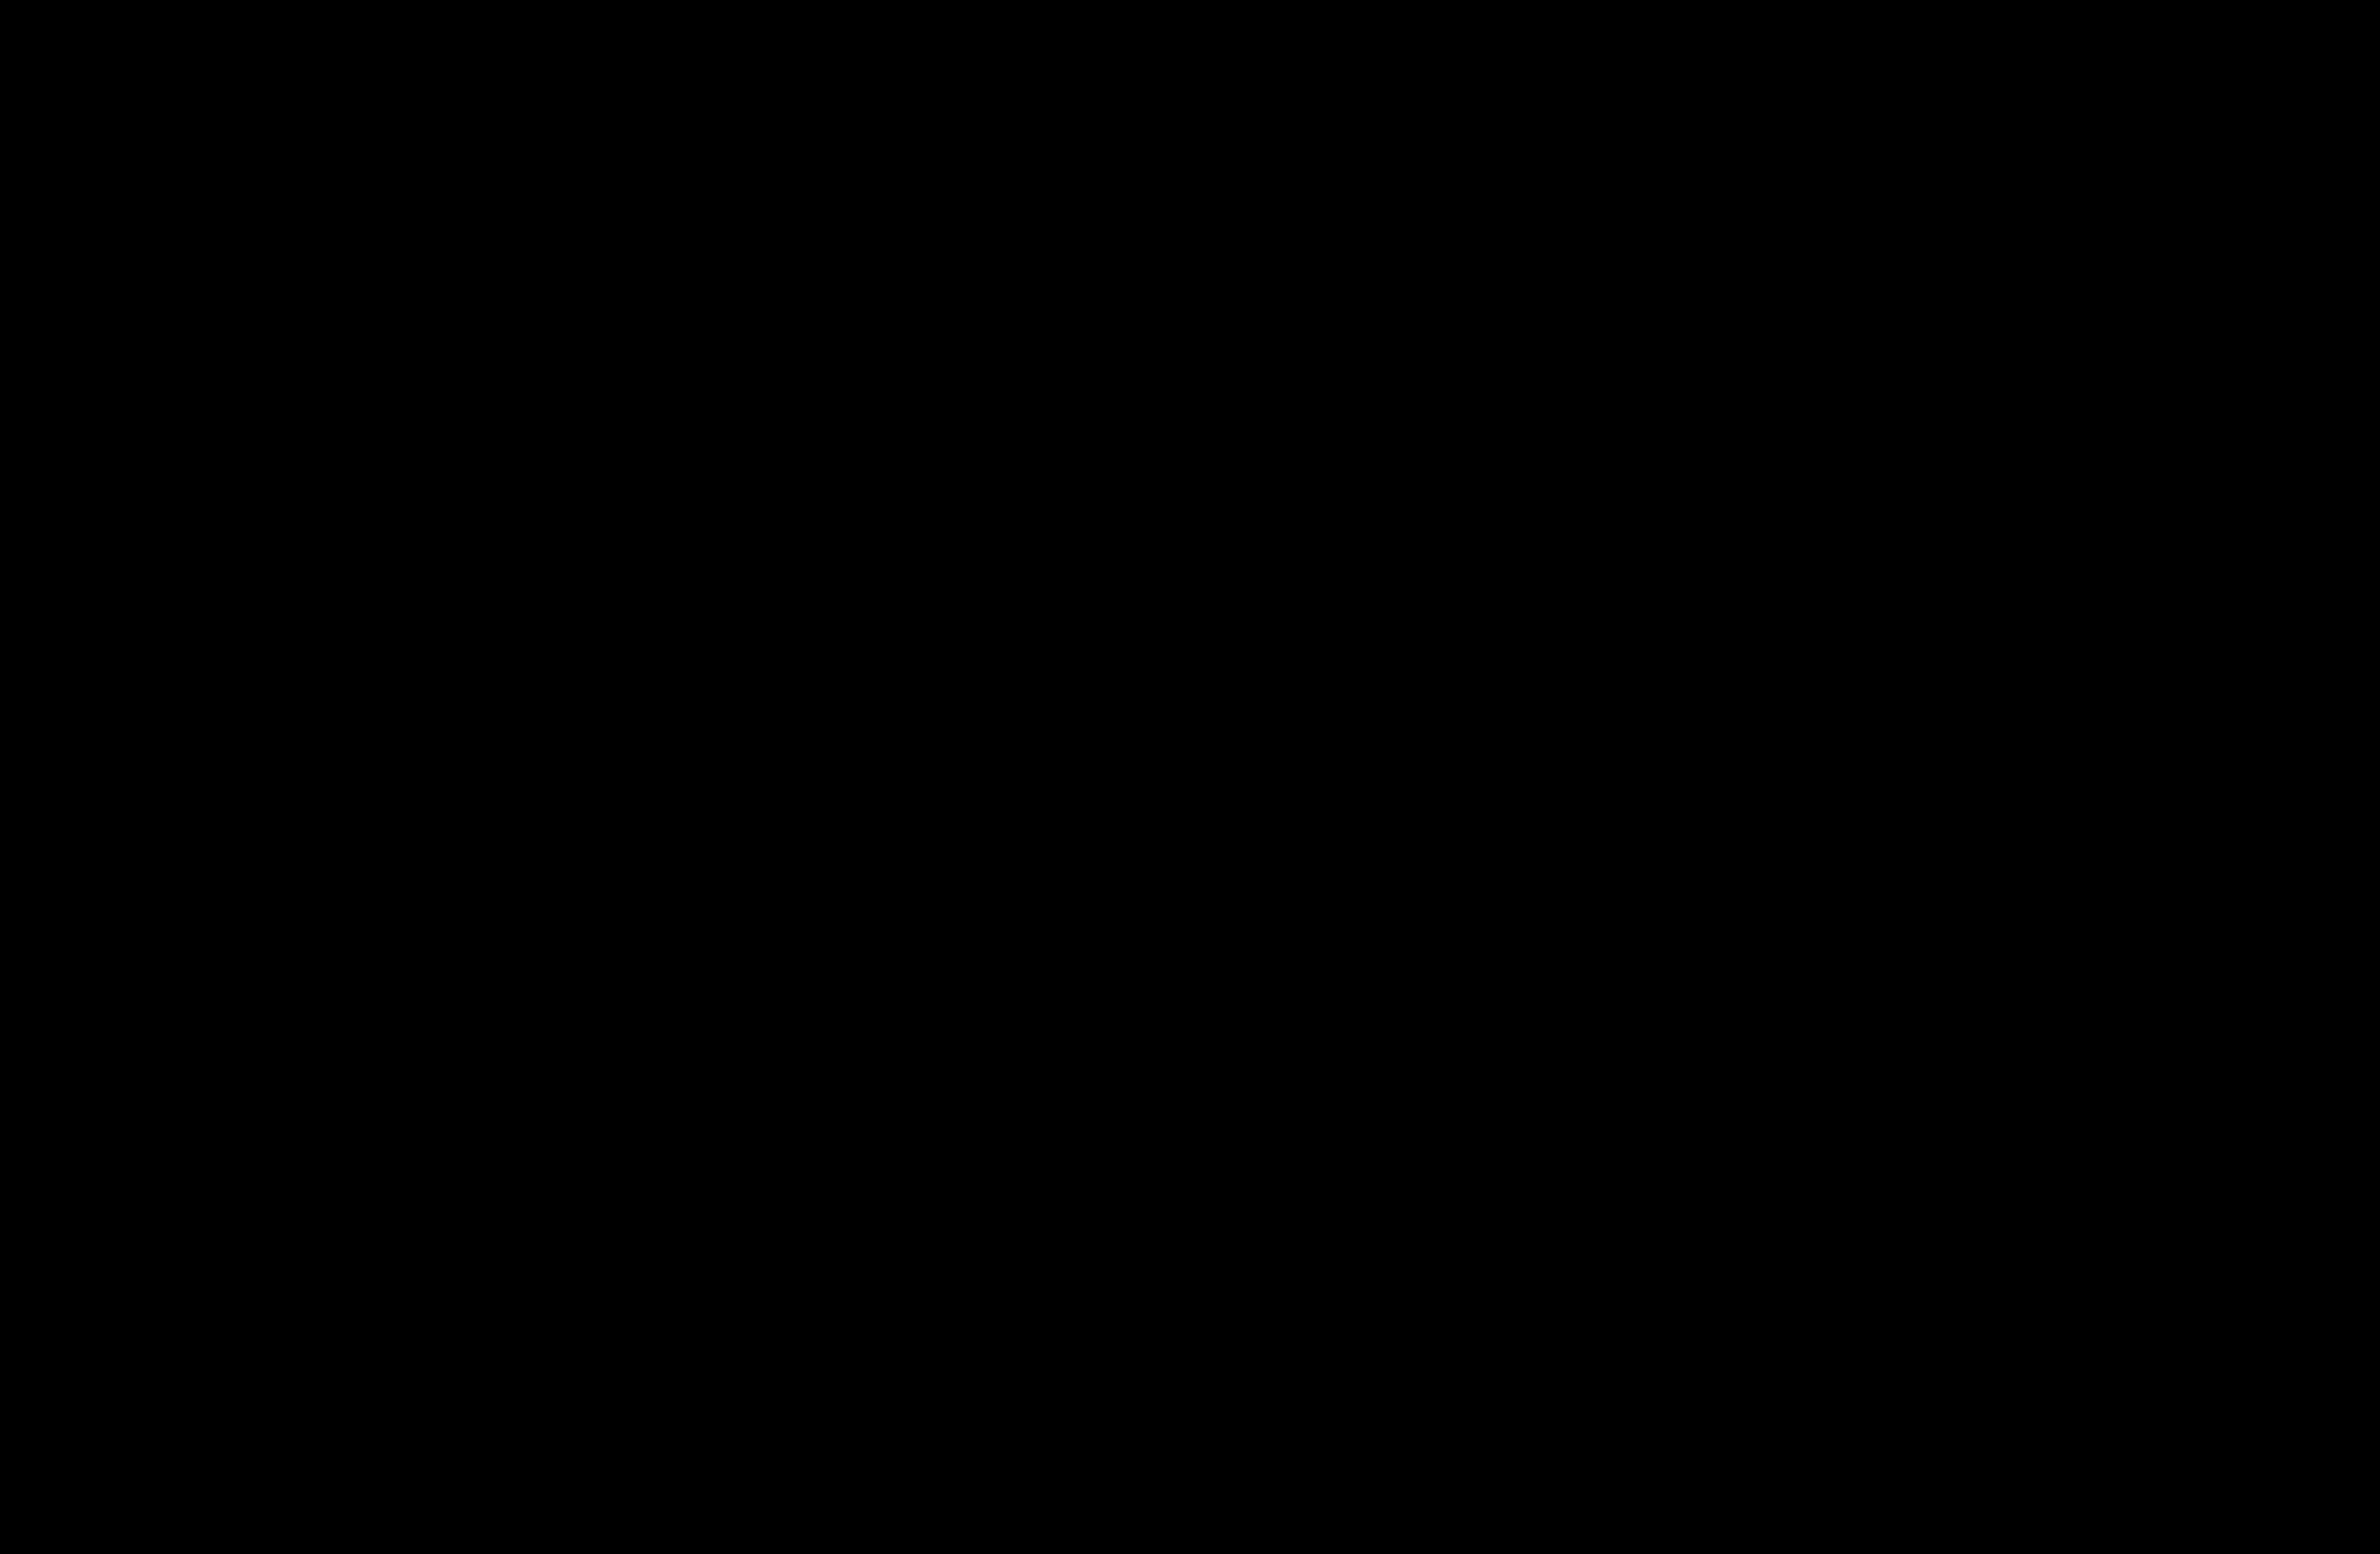 calshot-23